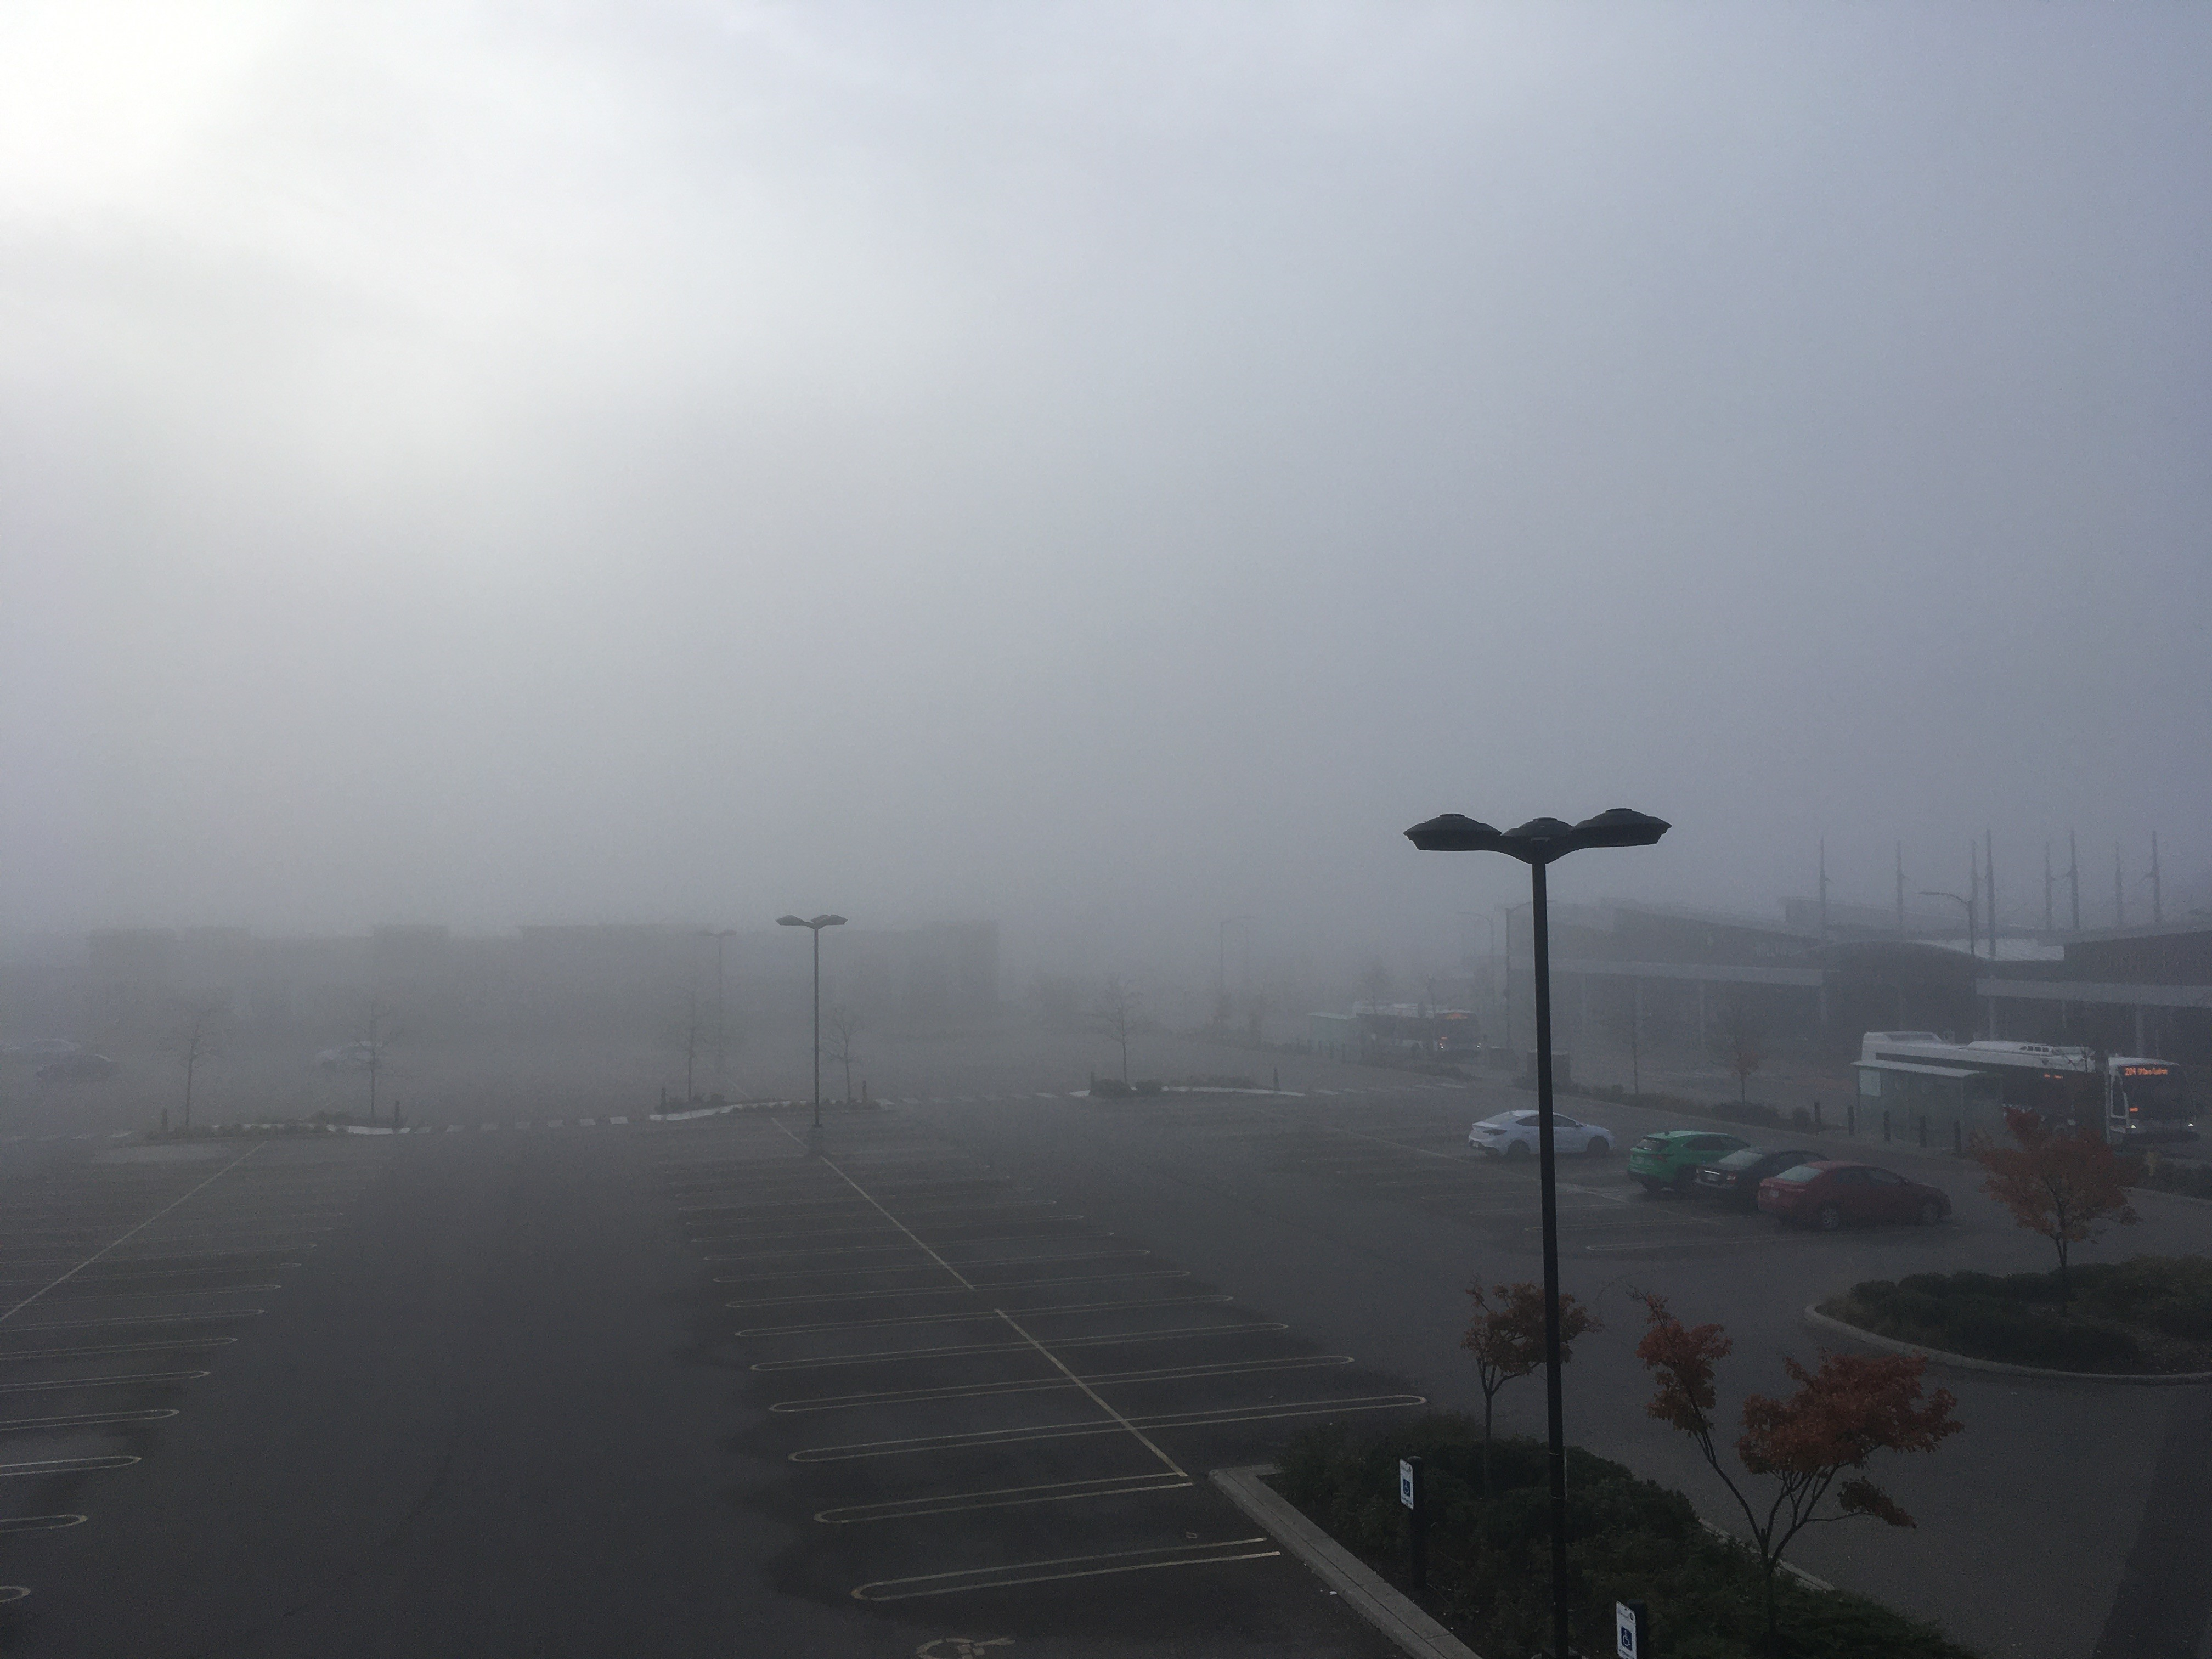 Fog advisory lifted (update)